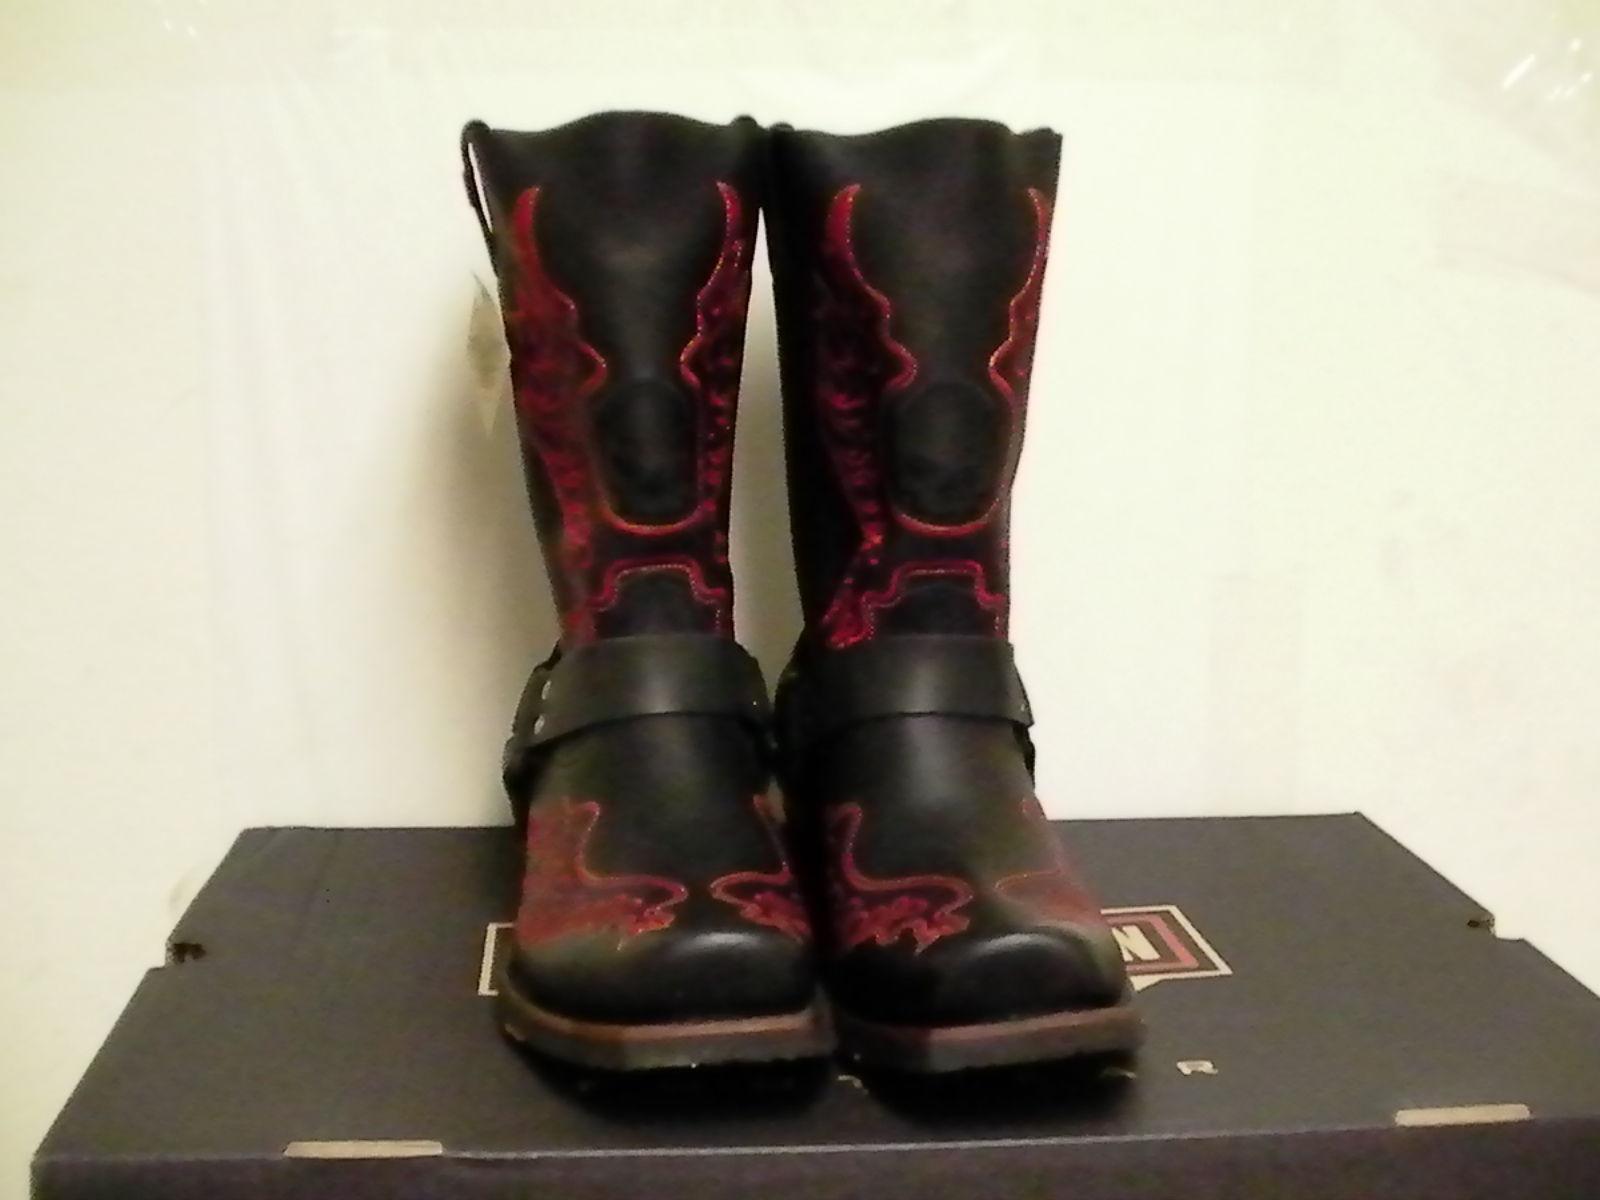 62f52094ce28 Harley davidson boots slayton riding oil resisting square toe size 7.5 us  new -  148.44